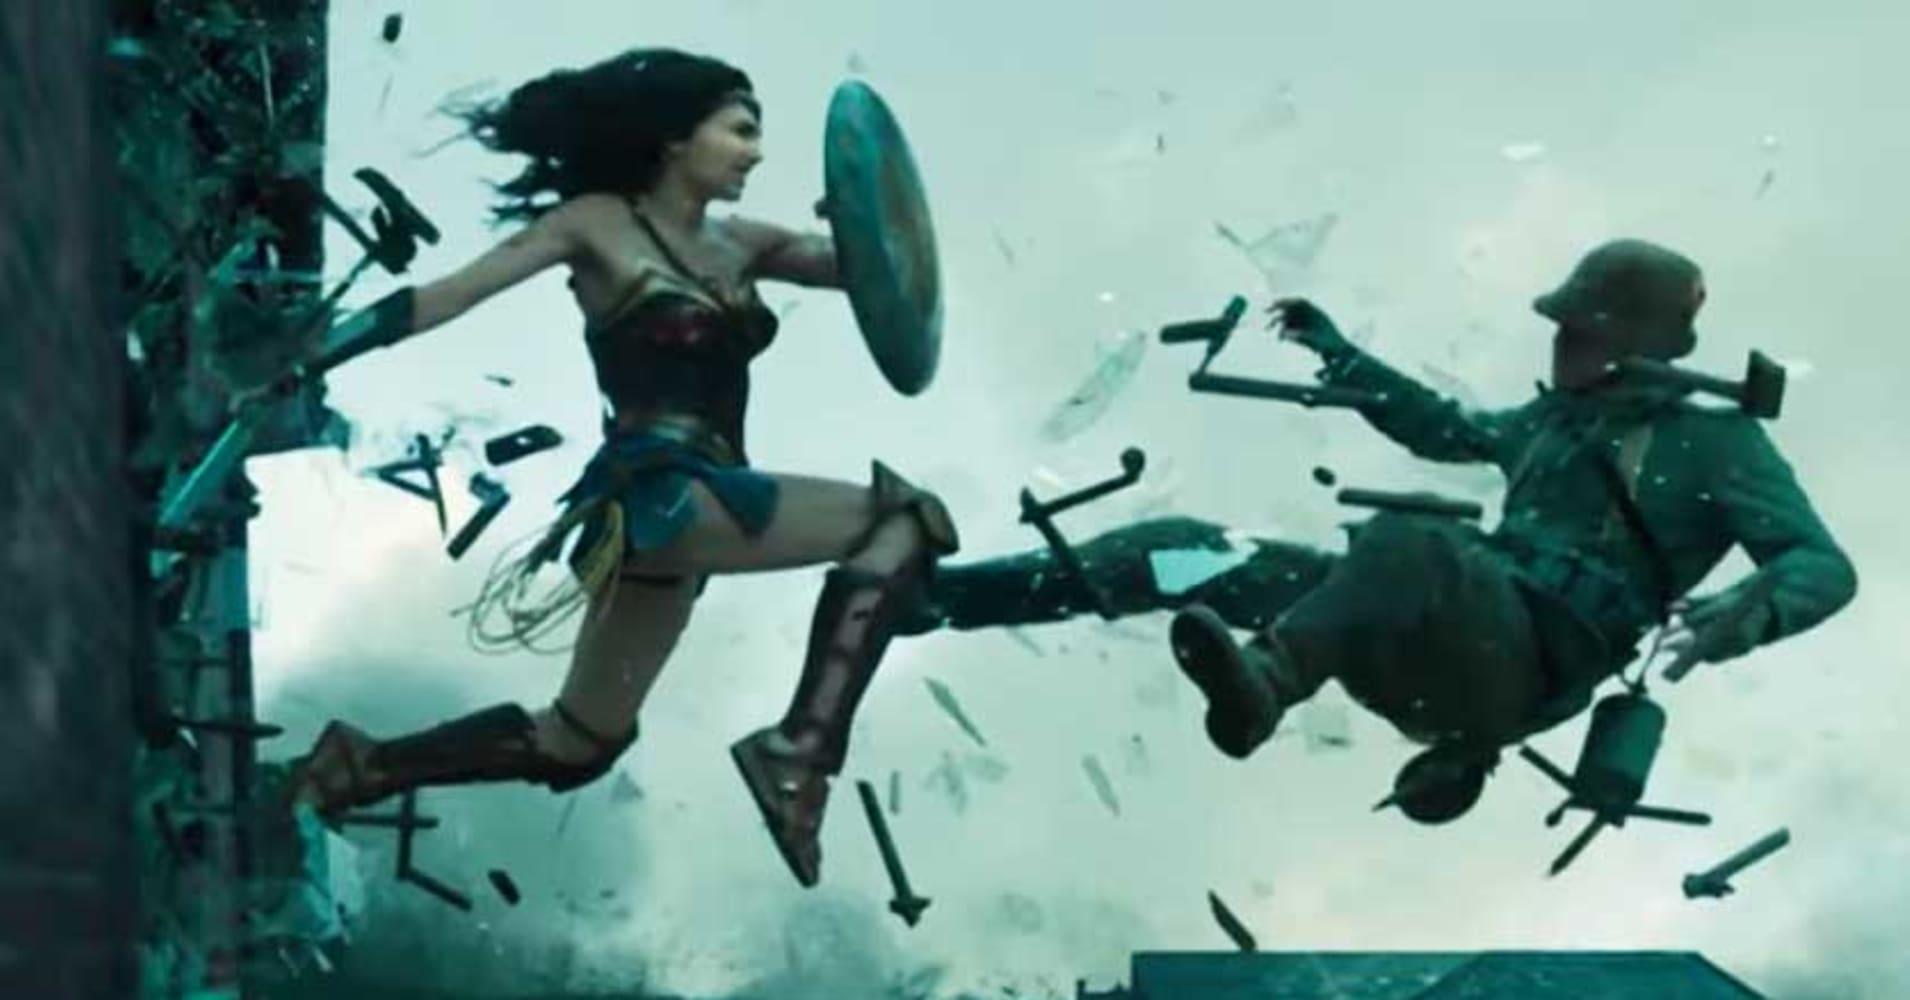 wonder woman set to break the superhero movie mold